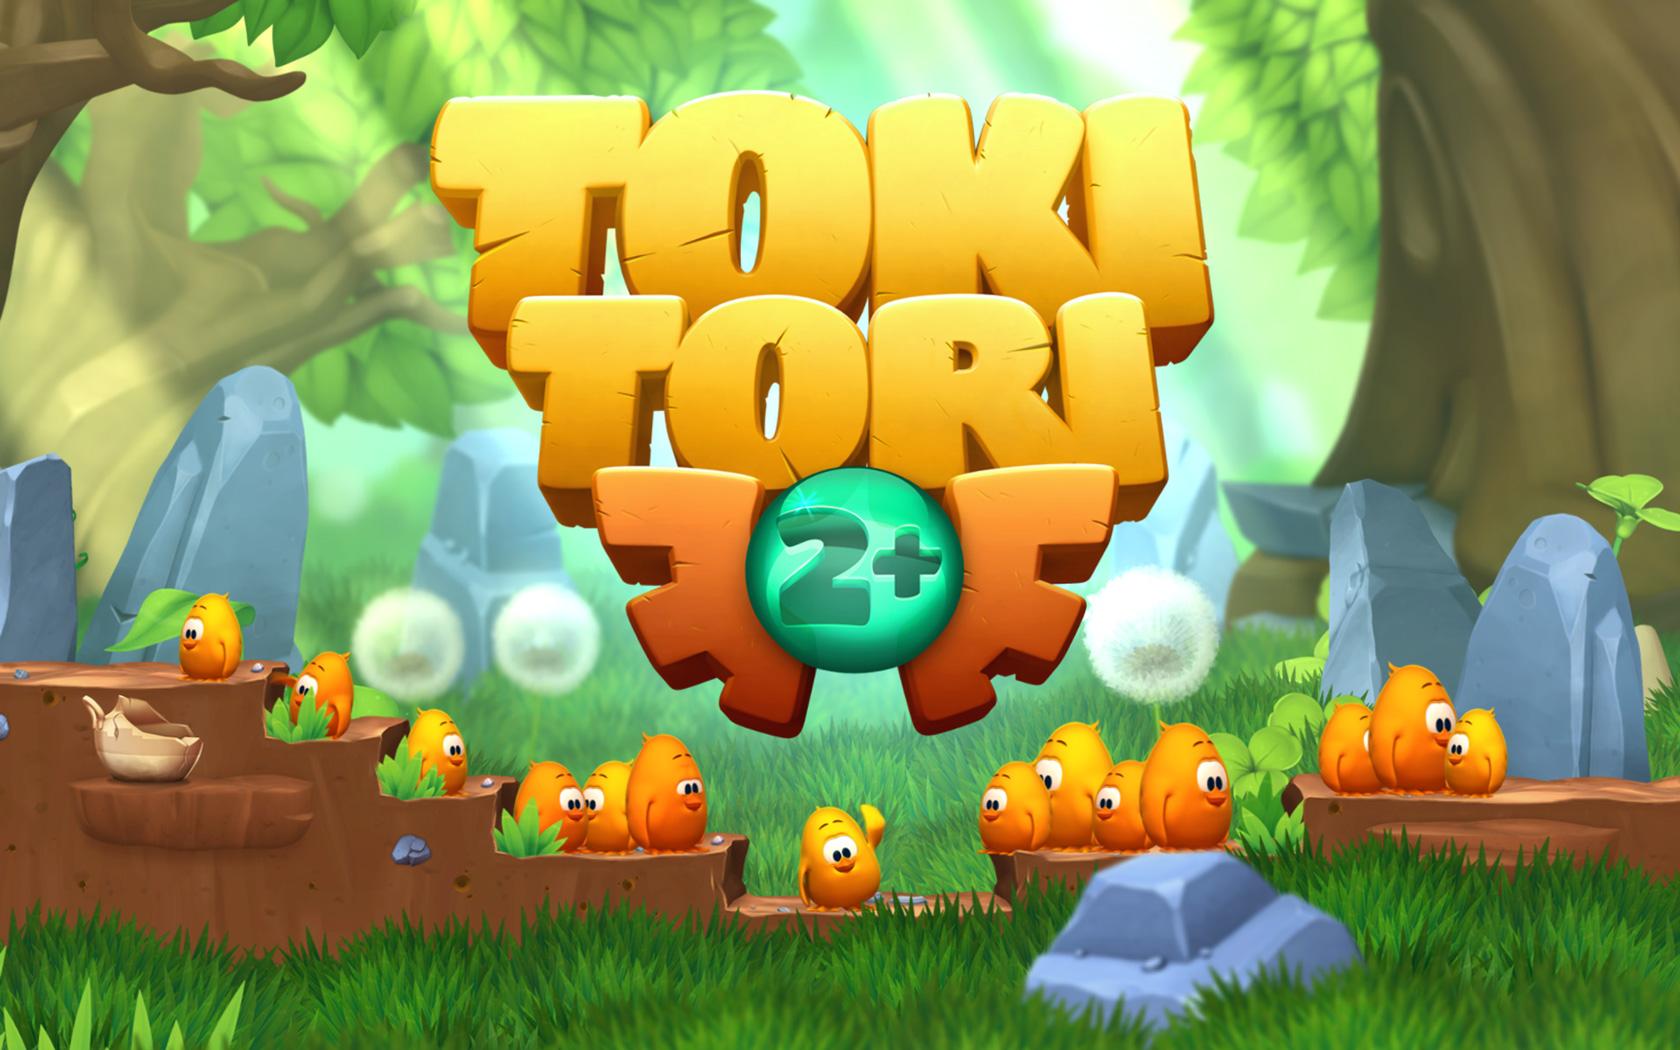 Free Toki Tori 2 Wallpaper in 1680x1050